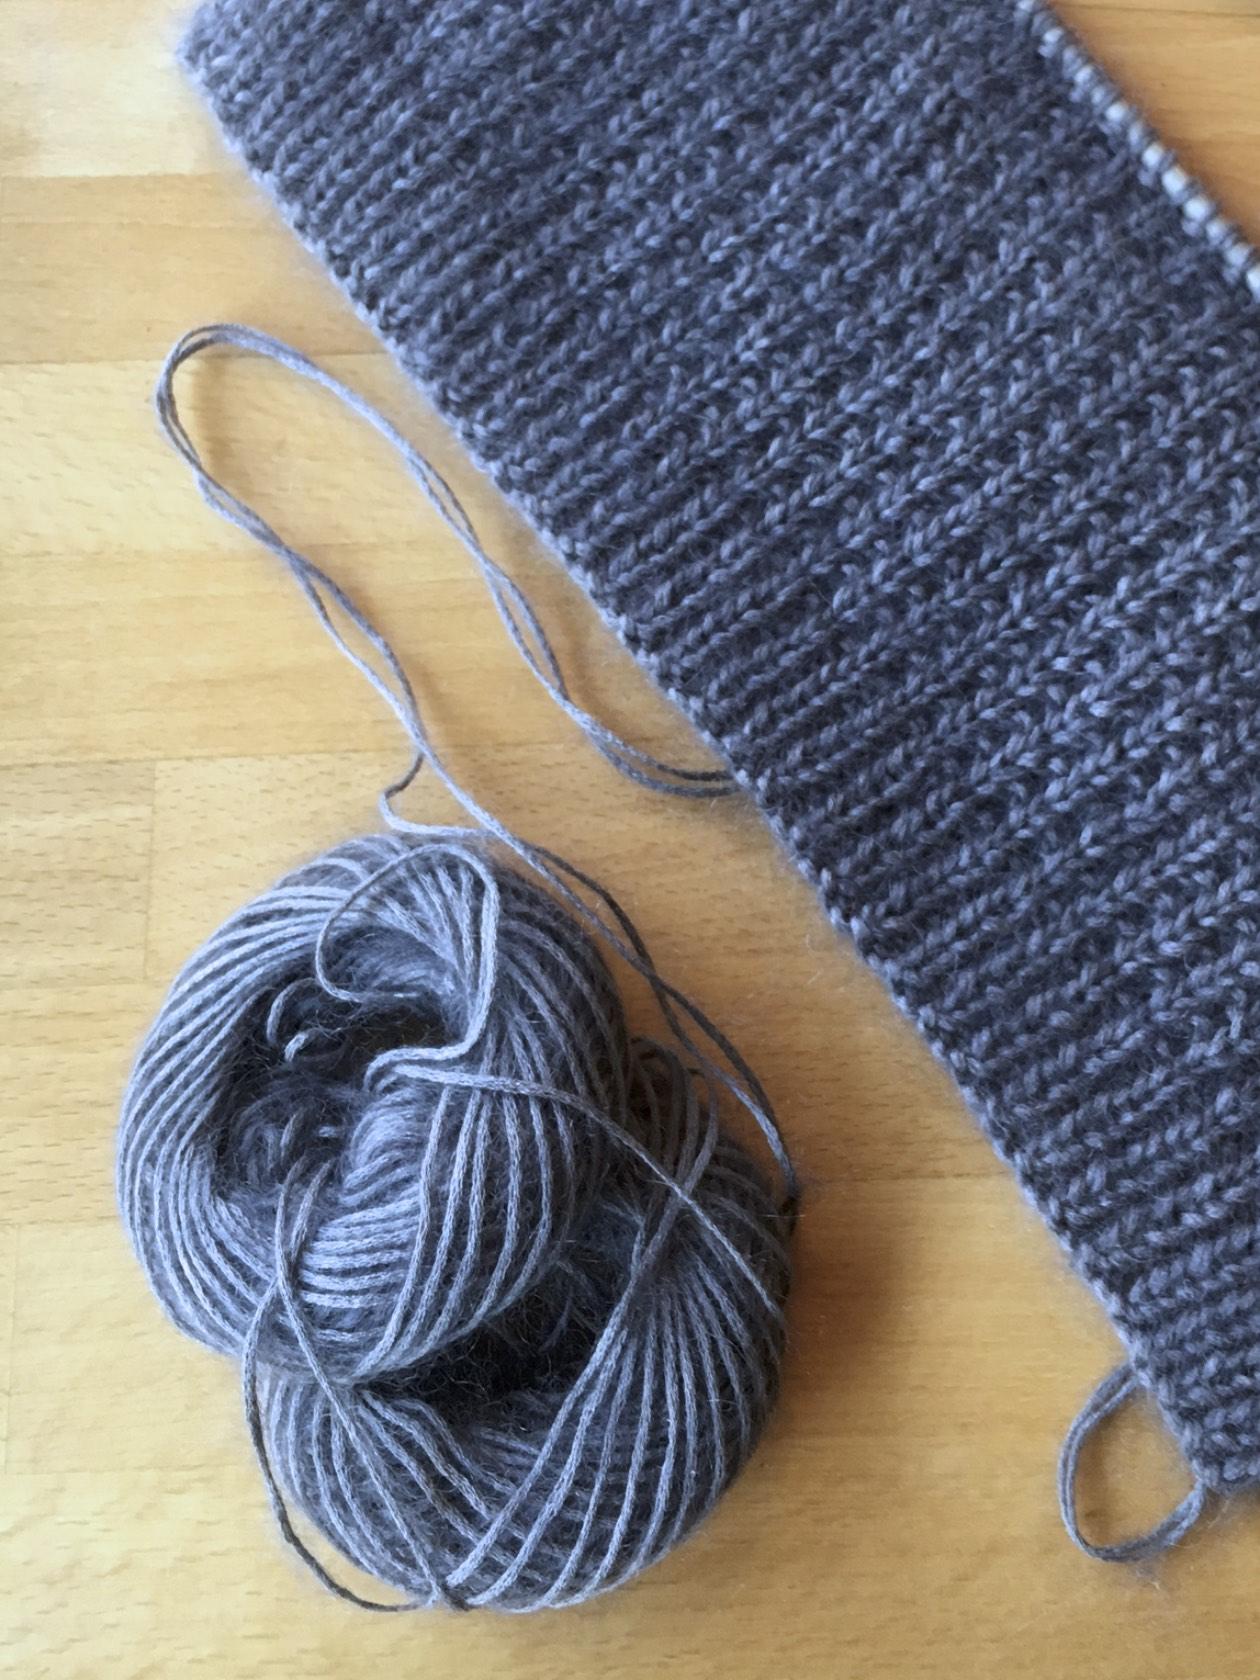 Looking for knitters, blogs, yarn shops,….